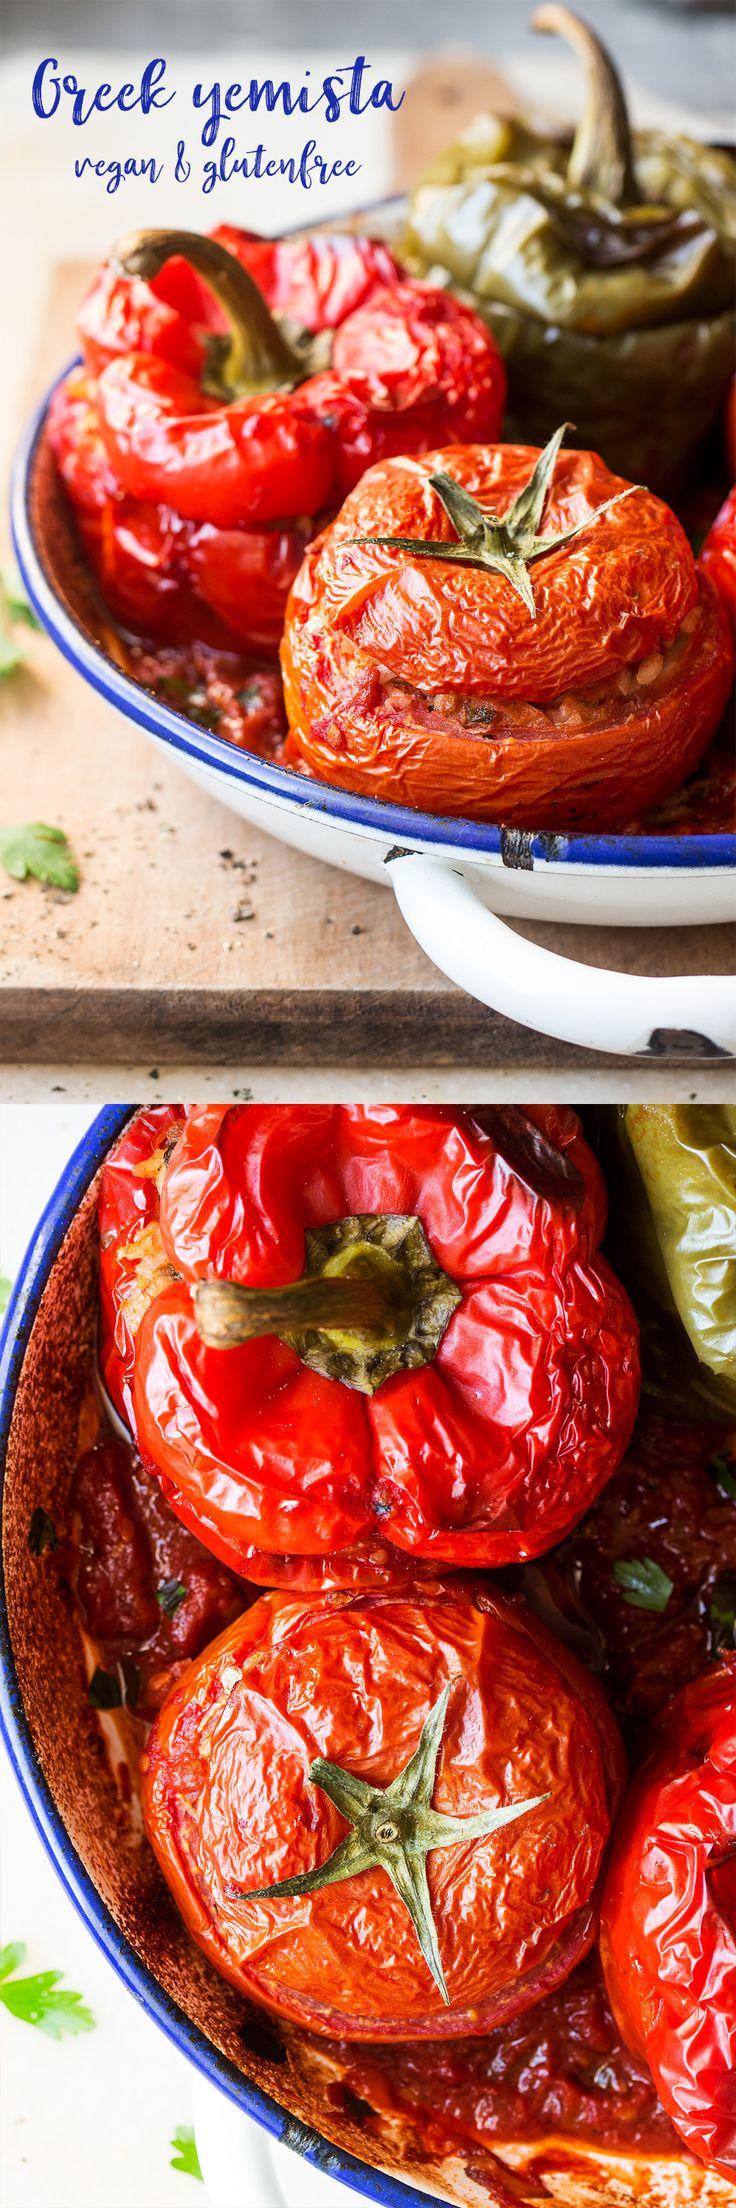 #greek #entree #side #lunch #dinner #gemista #yemista #stuffed #peppers #tomatoes #vegan #glutenfree #healthy